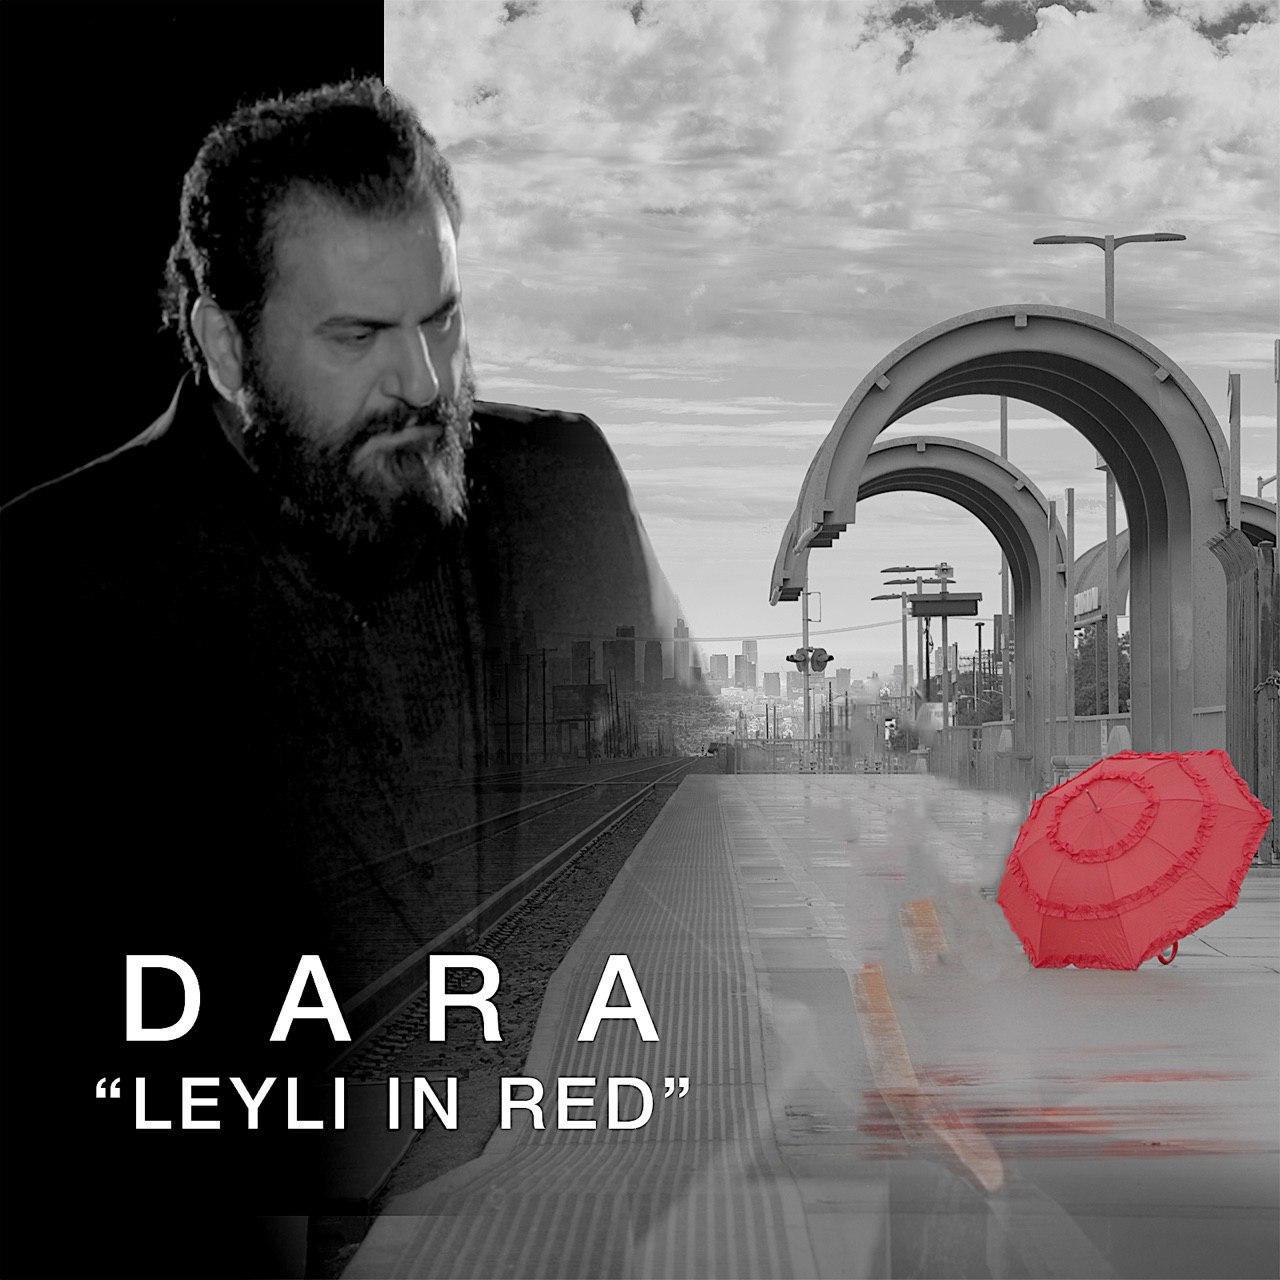 Dara Recording Artist – Leyli In Red